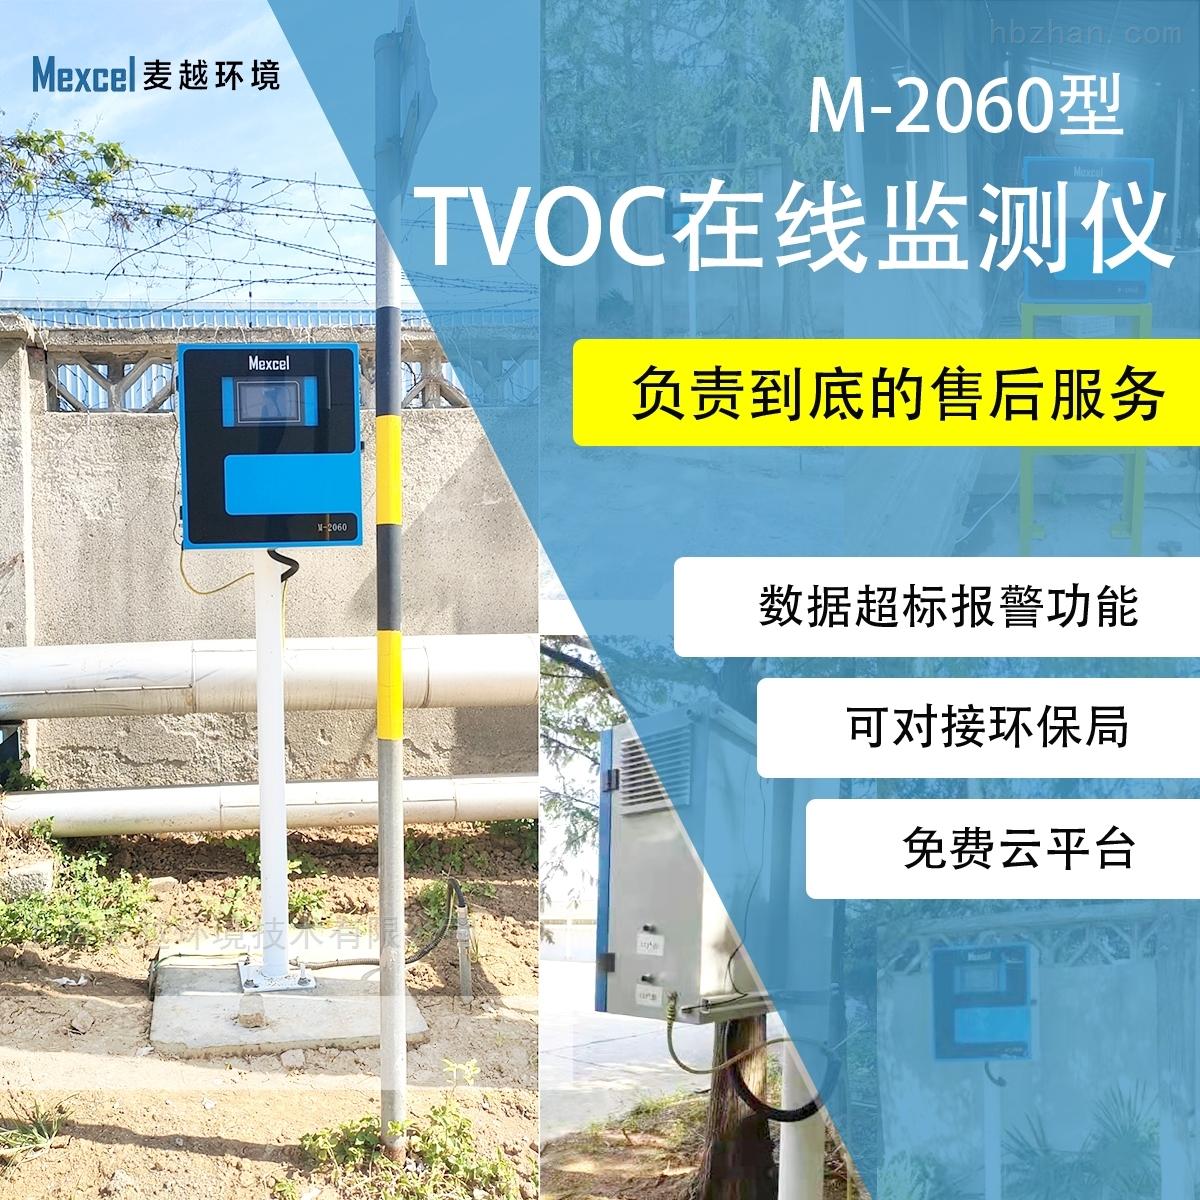 VOCs在线监测设备可对接互联网